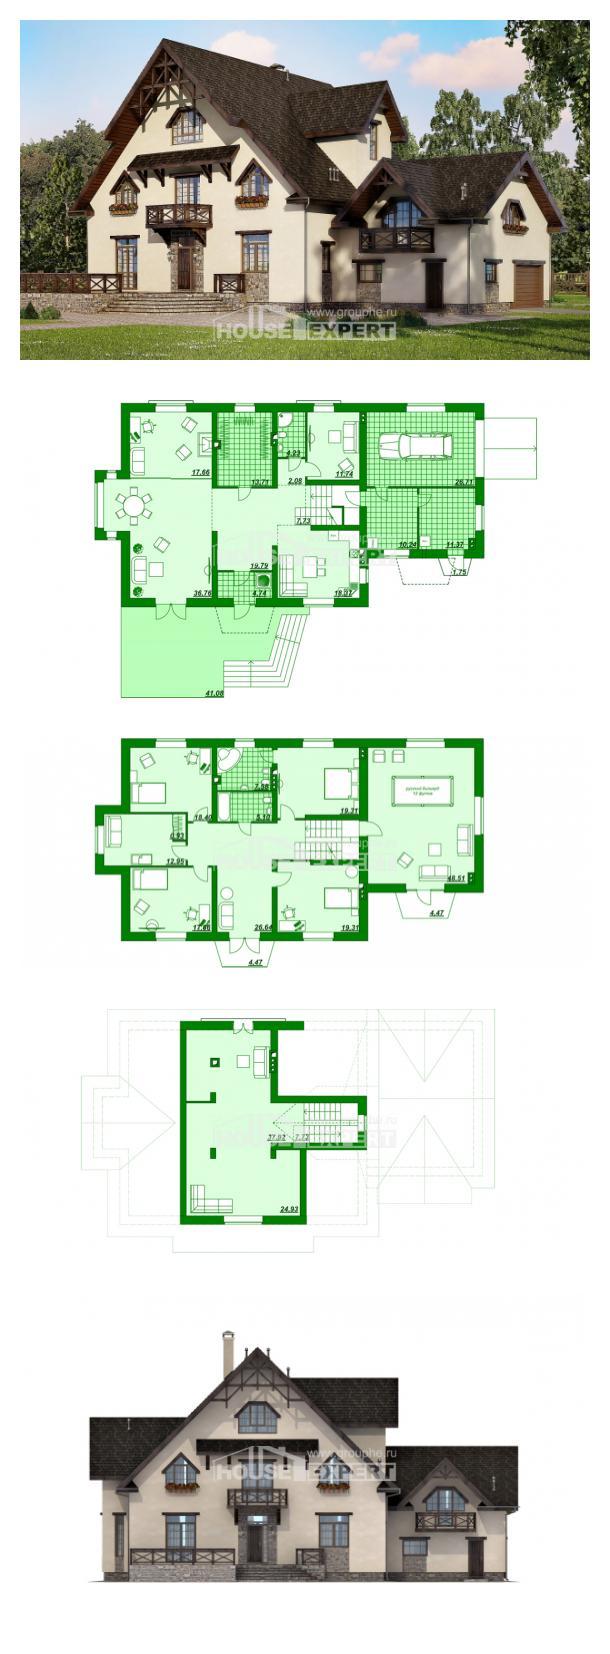 Projekt domu 435-002-R | House Expert